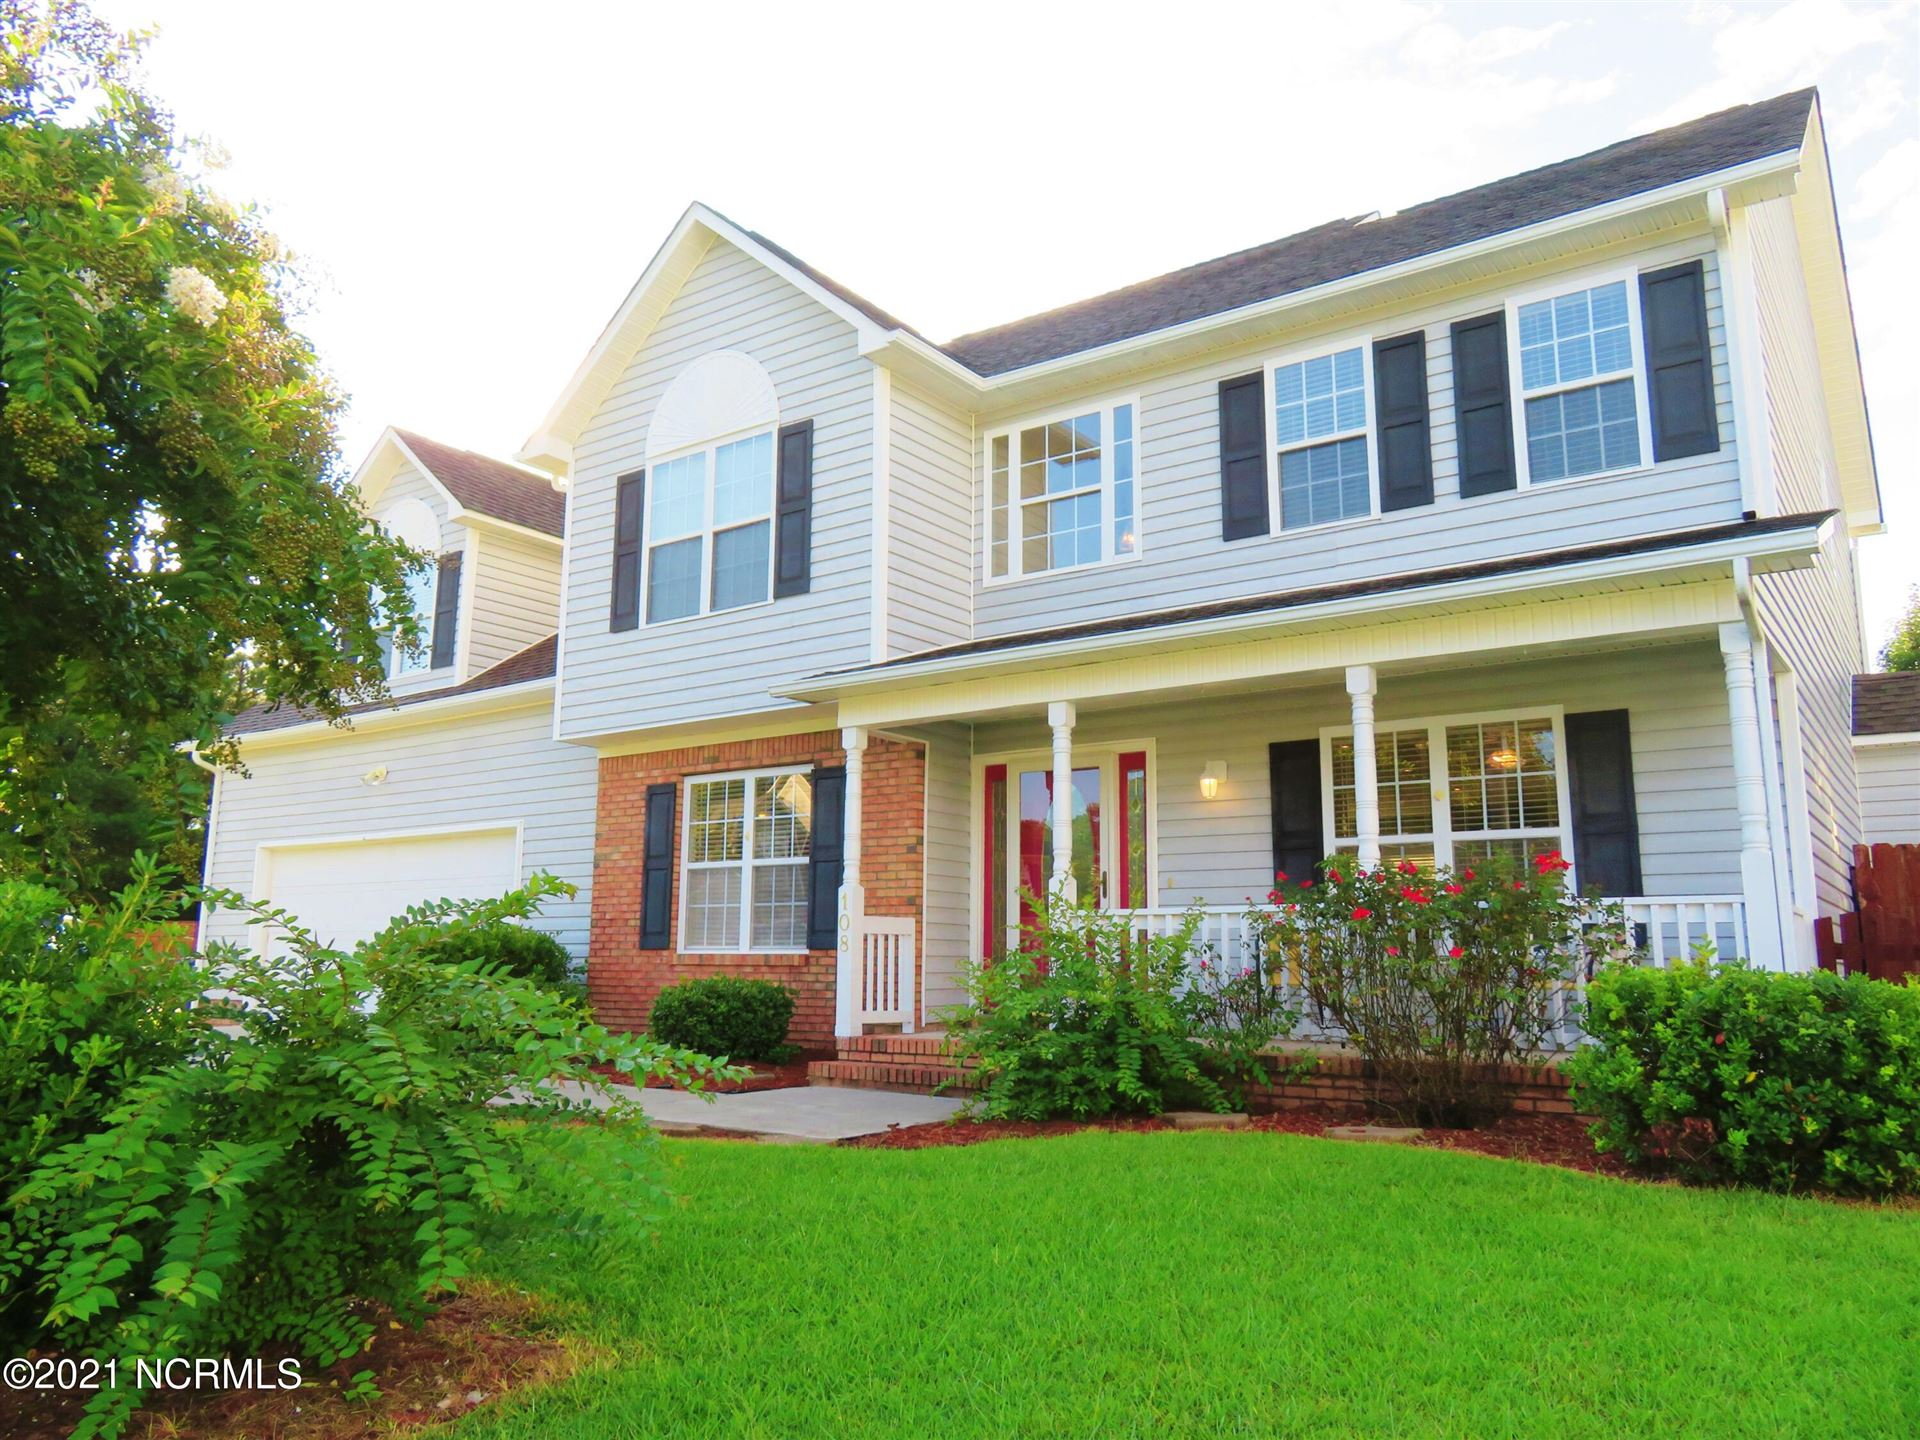 Photo of 108 Murville Court, Jacksonville, NC 28546 (MLS # 100287362)